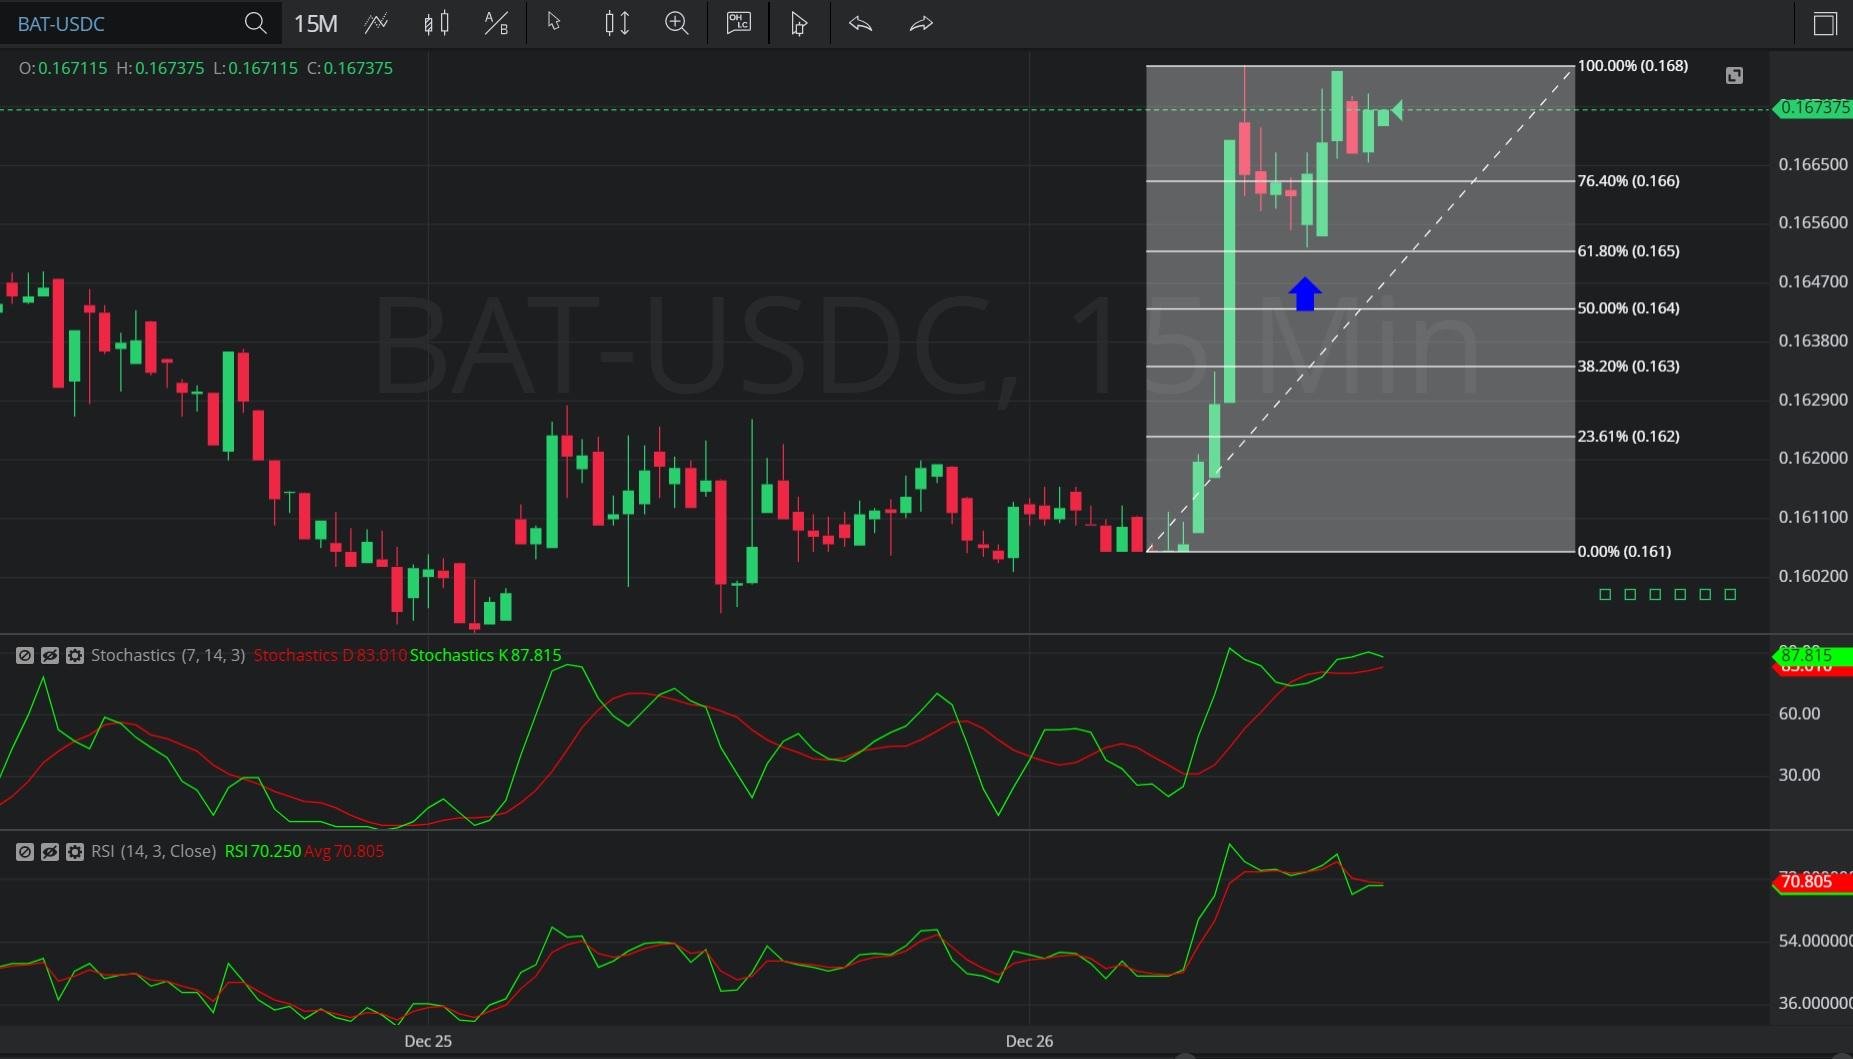 26 December 2019 - BAT/ USDC – 15-minute